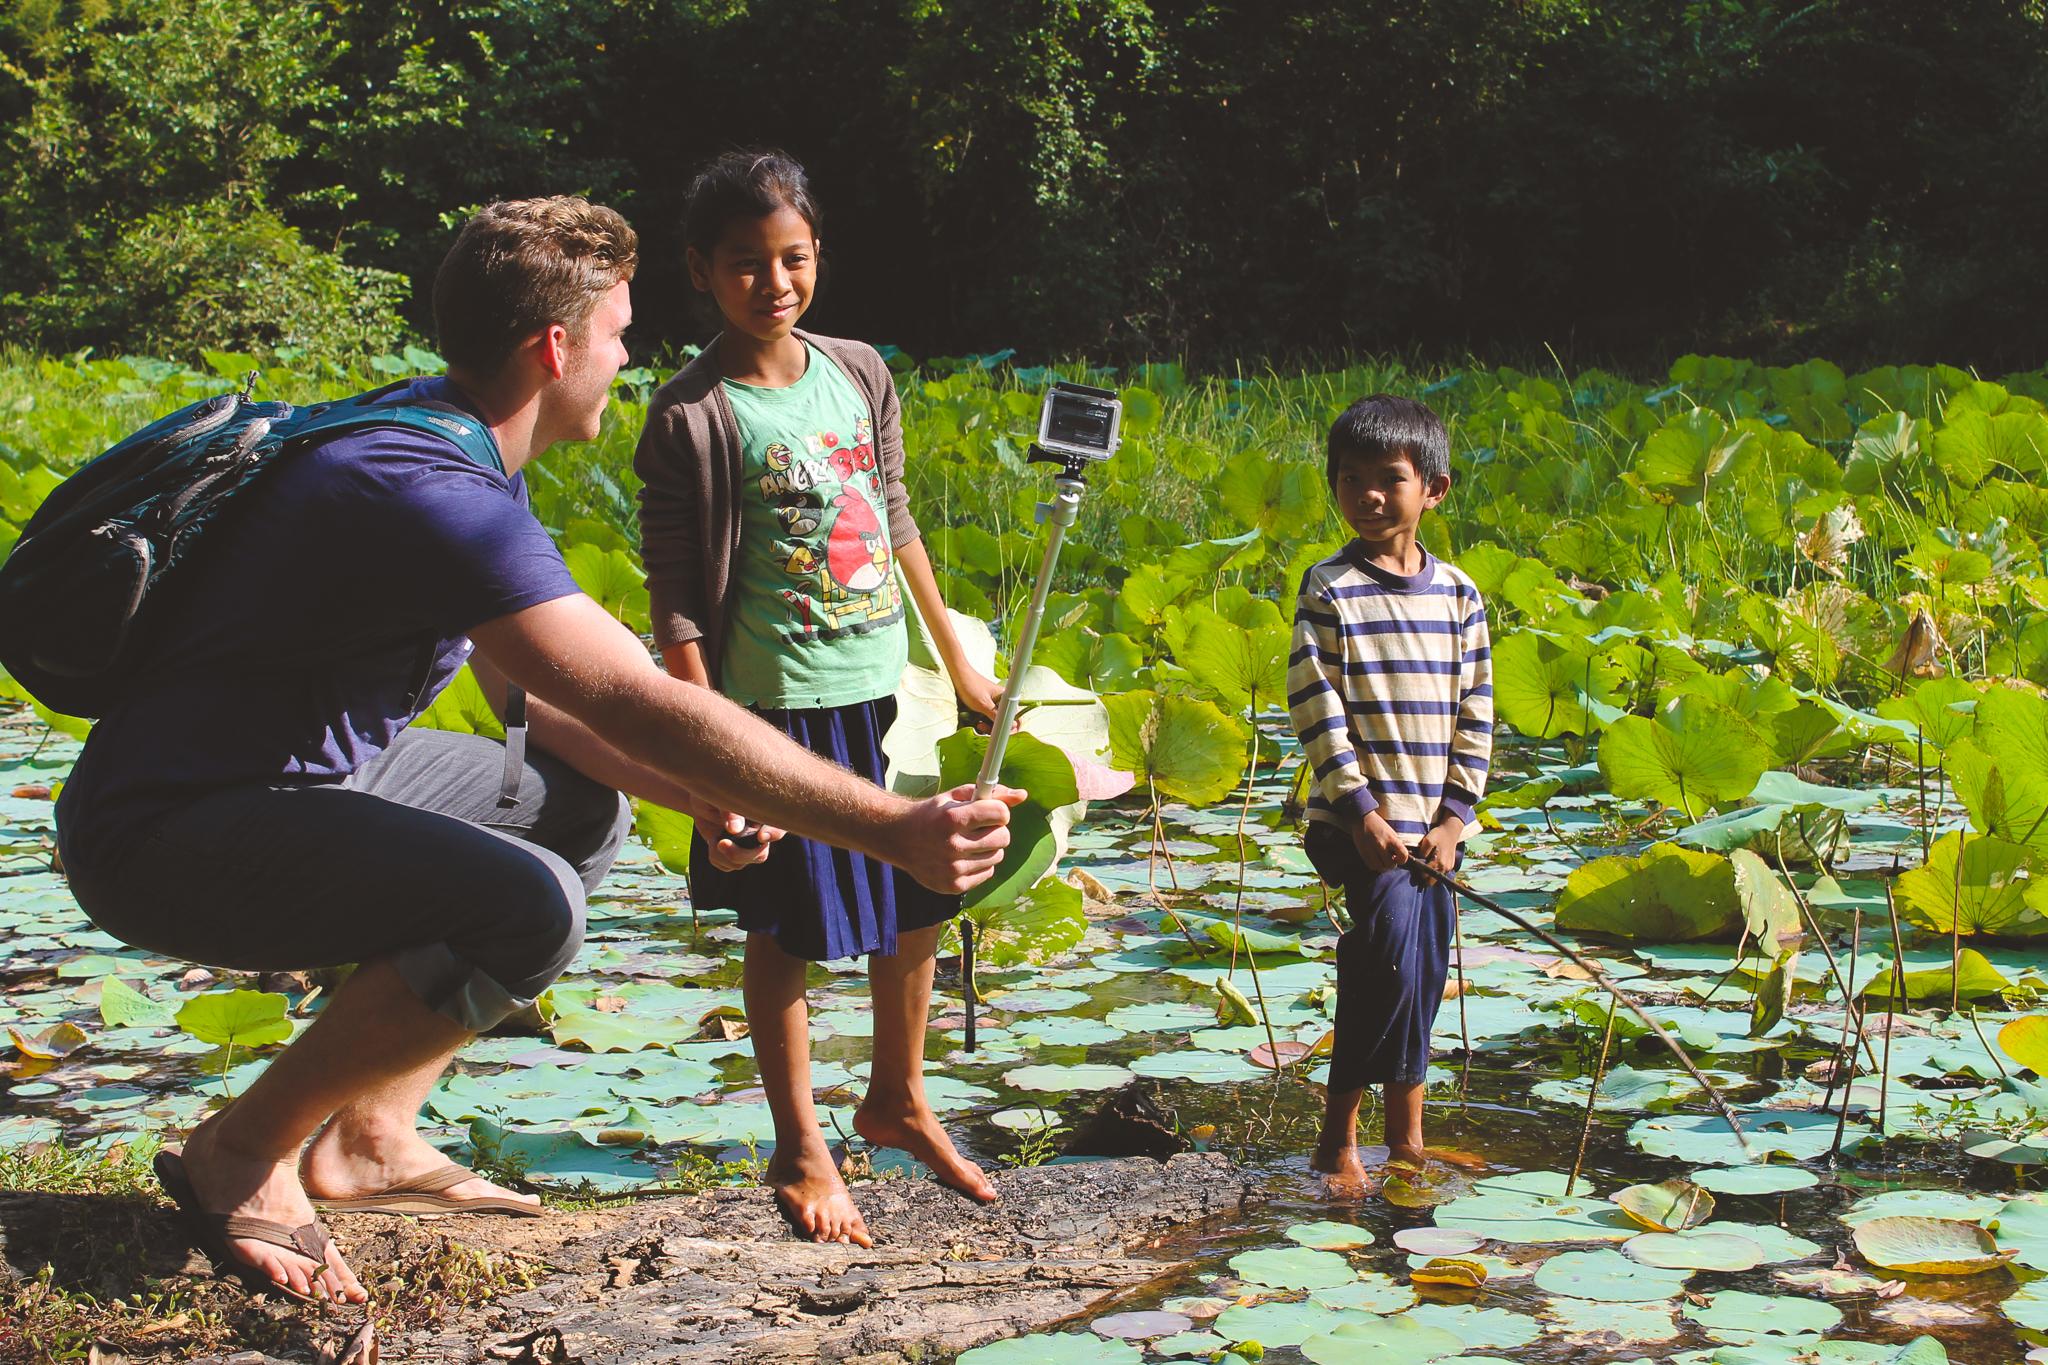 cambodia blog (20 of 34).jpg